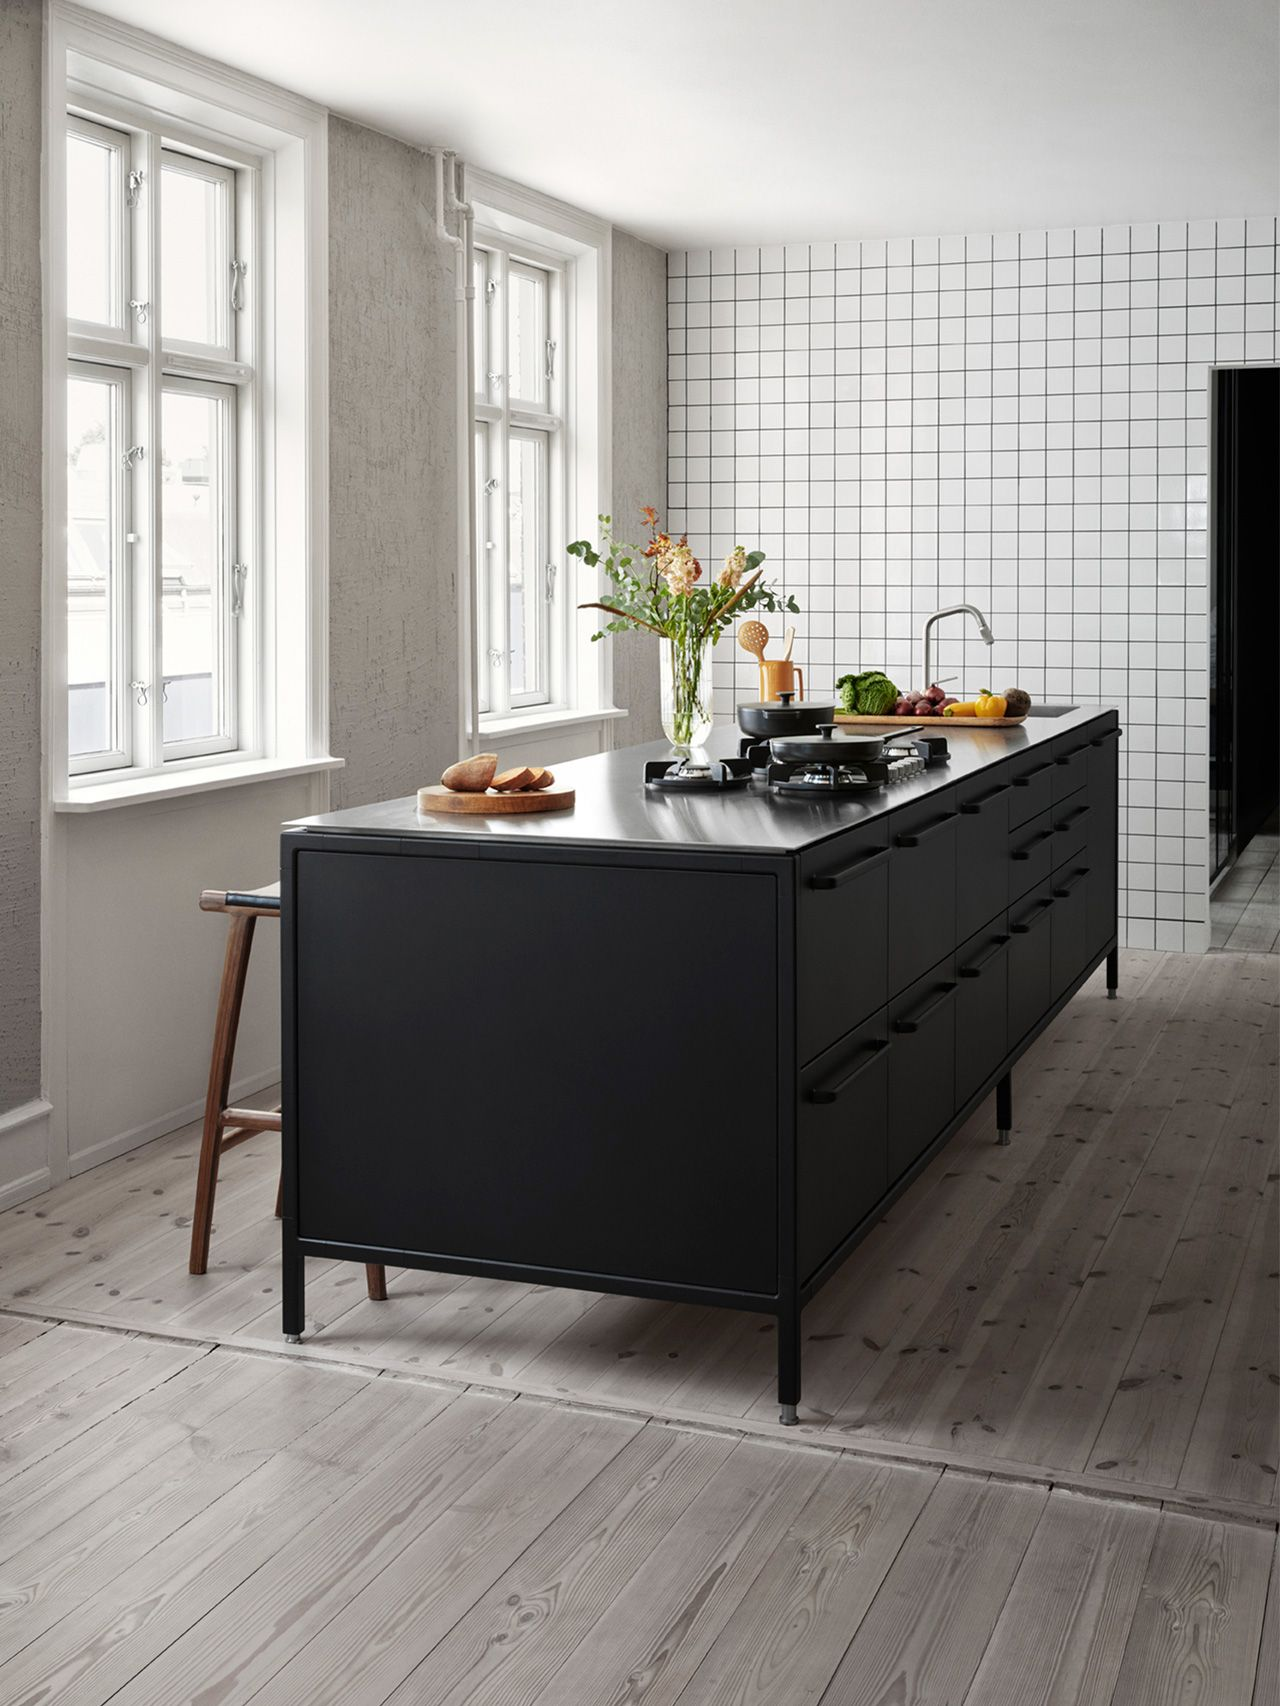 Vipp Küche | vipp.com #køkkeninspiration